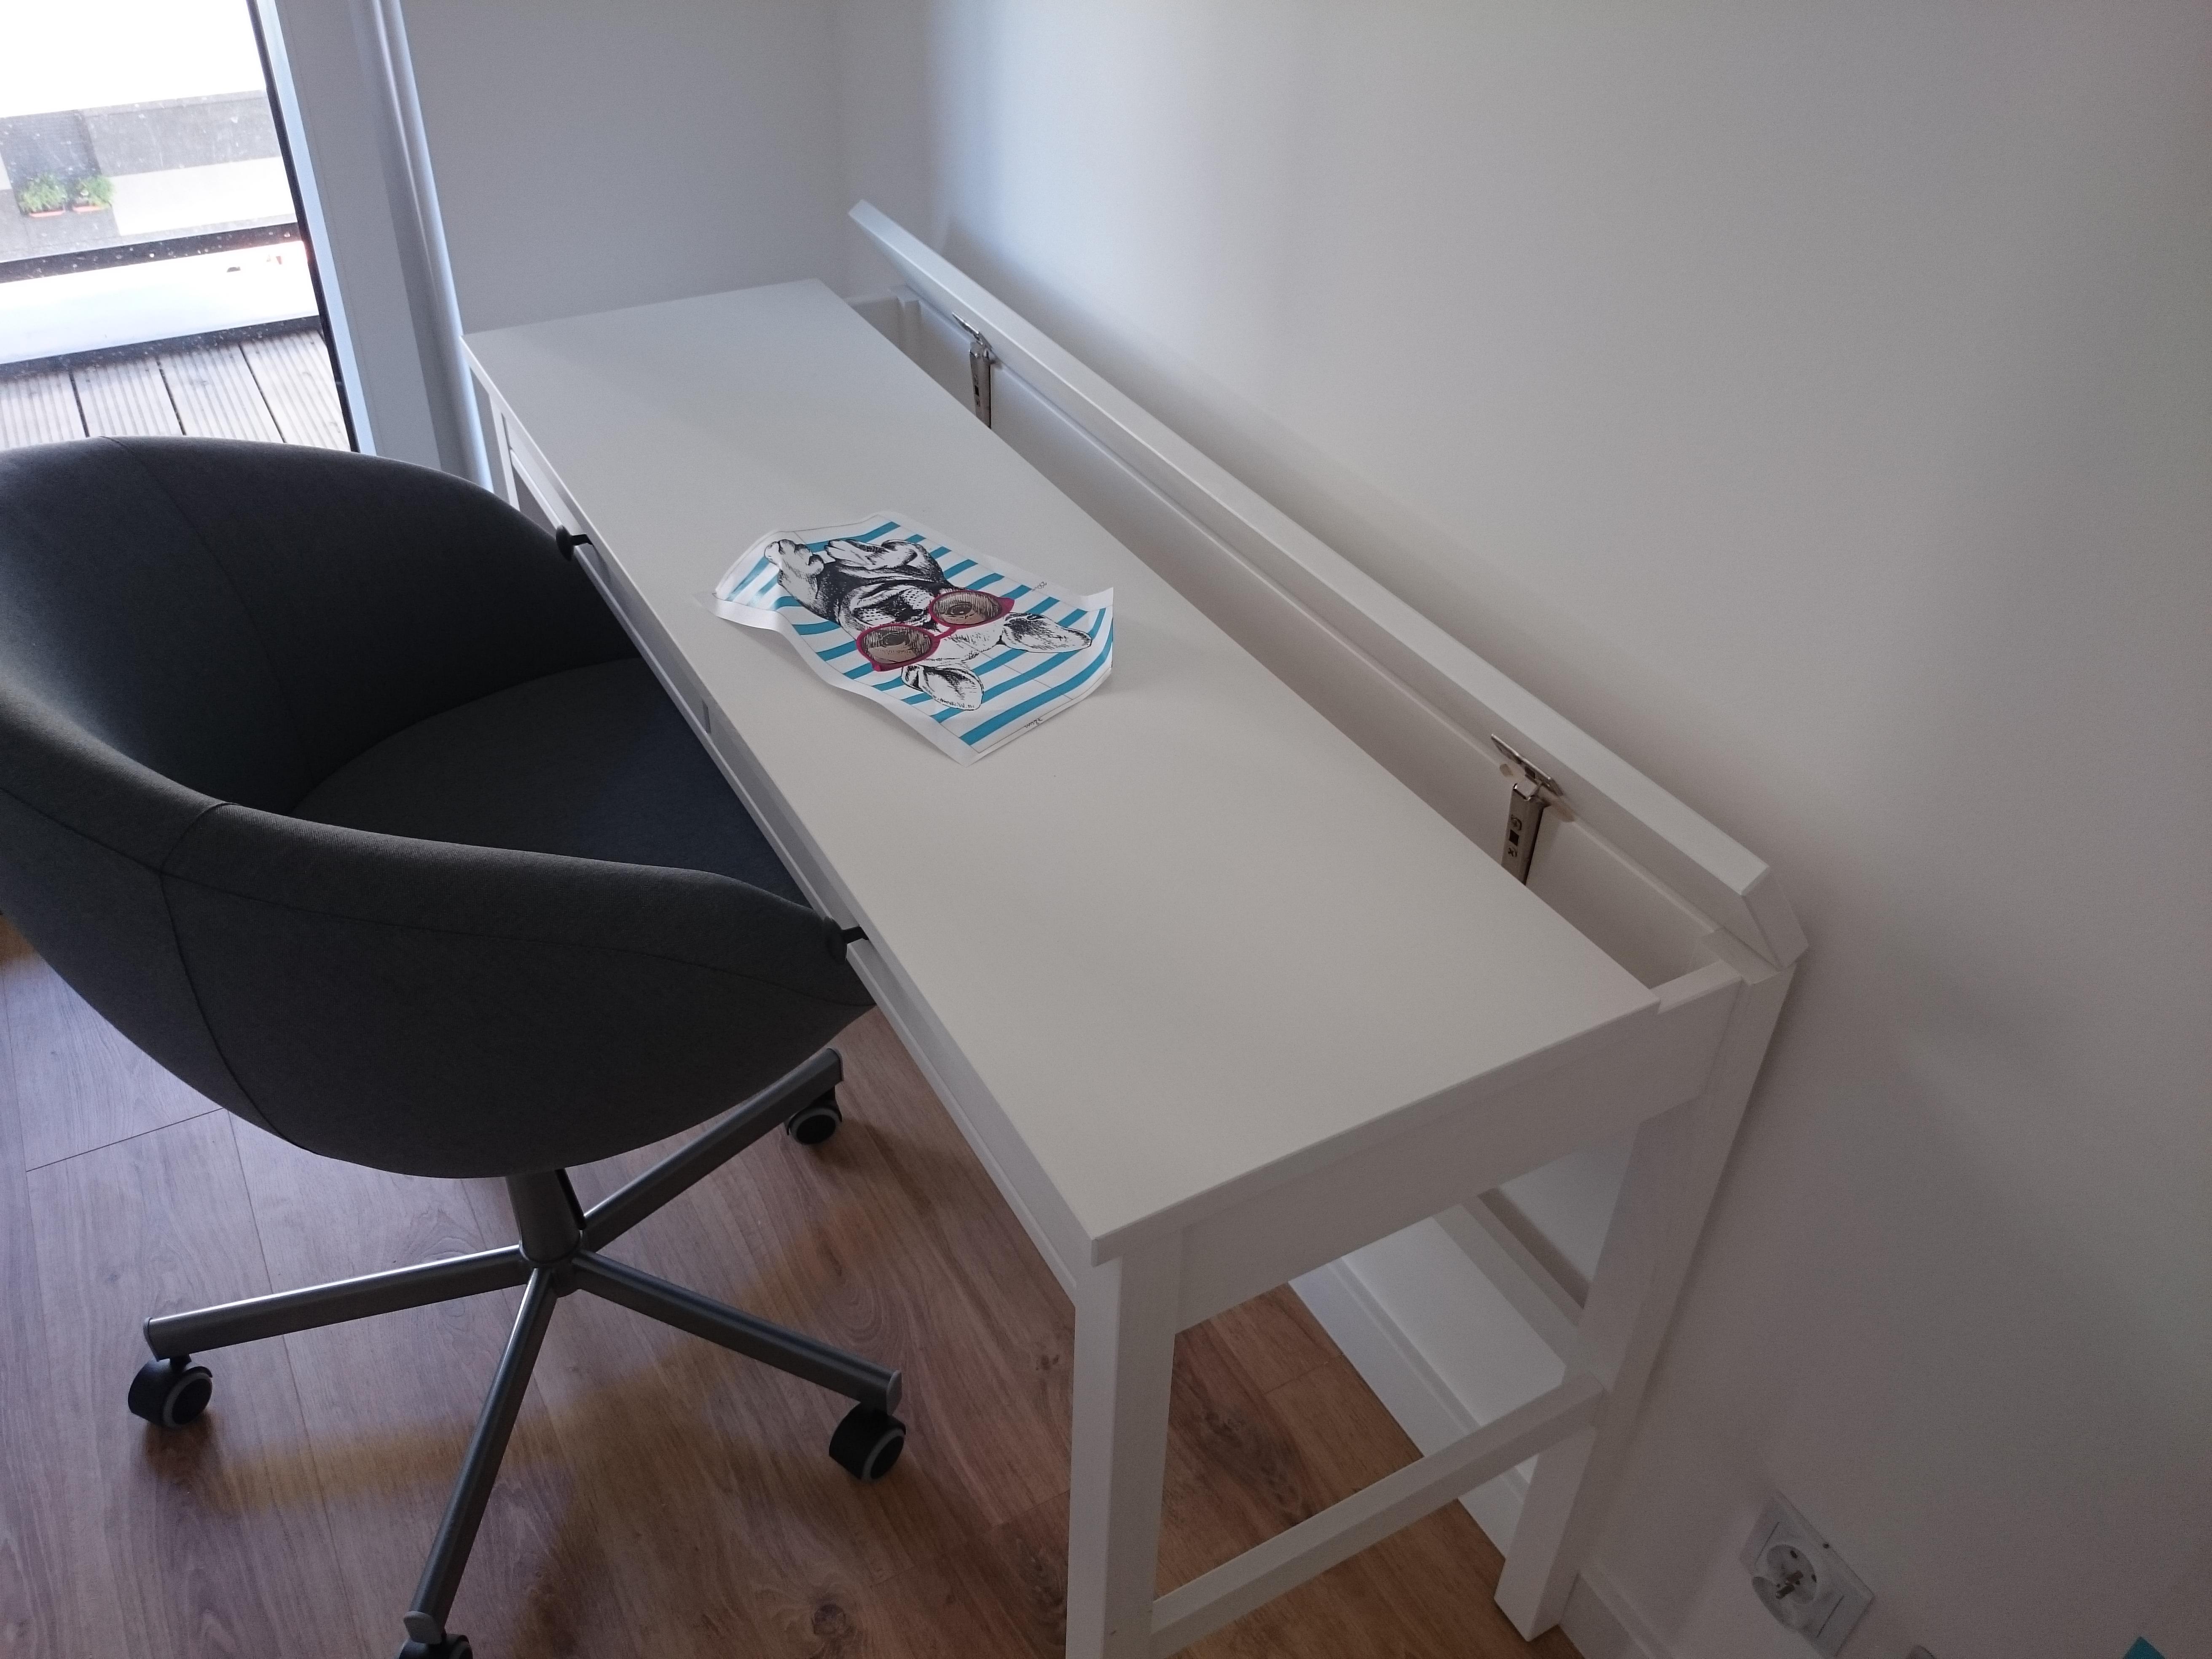 Montaż biurka HEMNES IKEA - Kraków